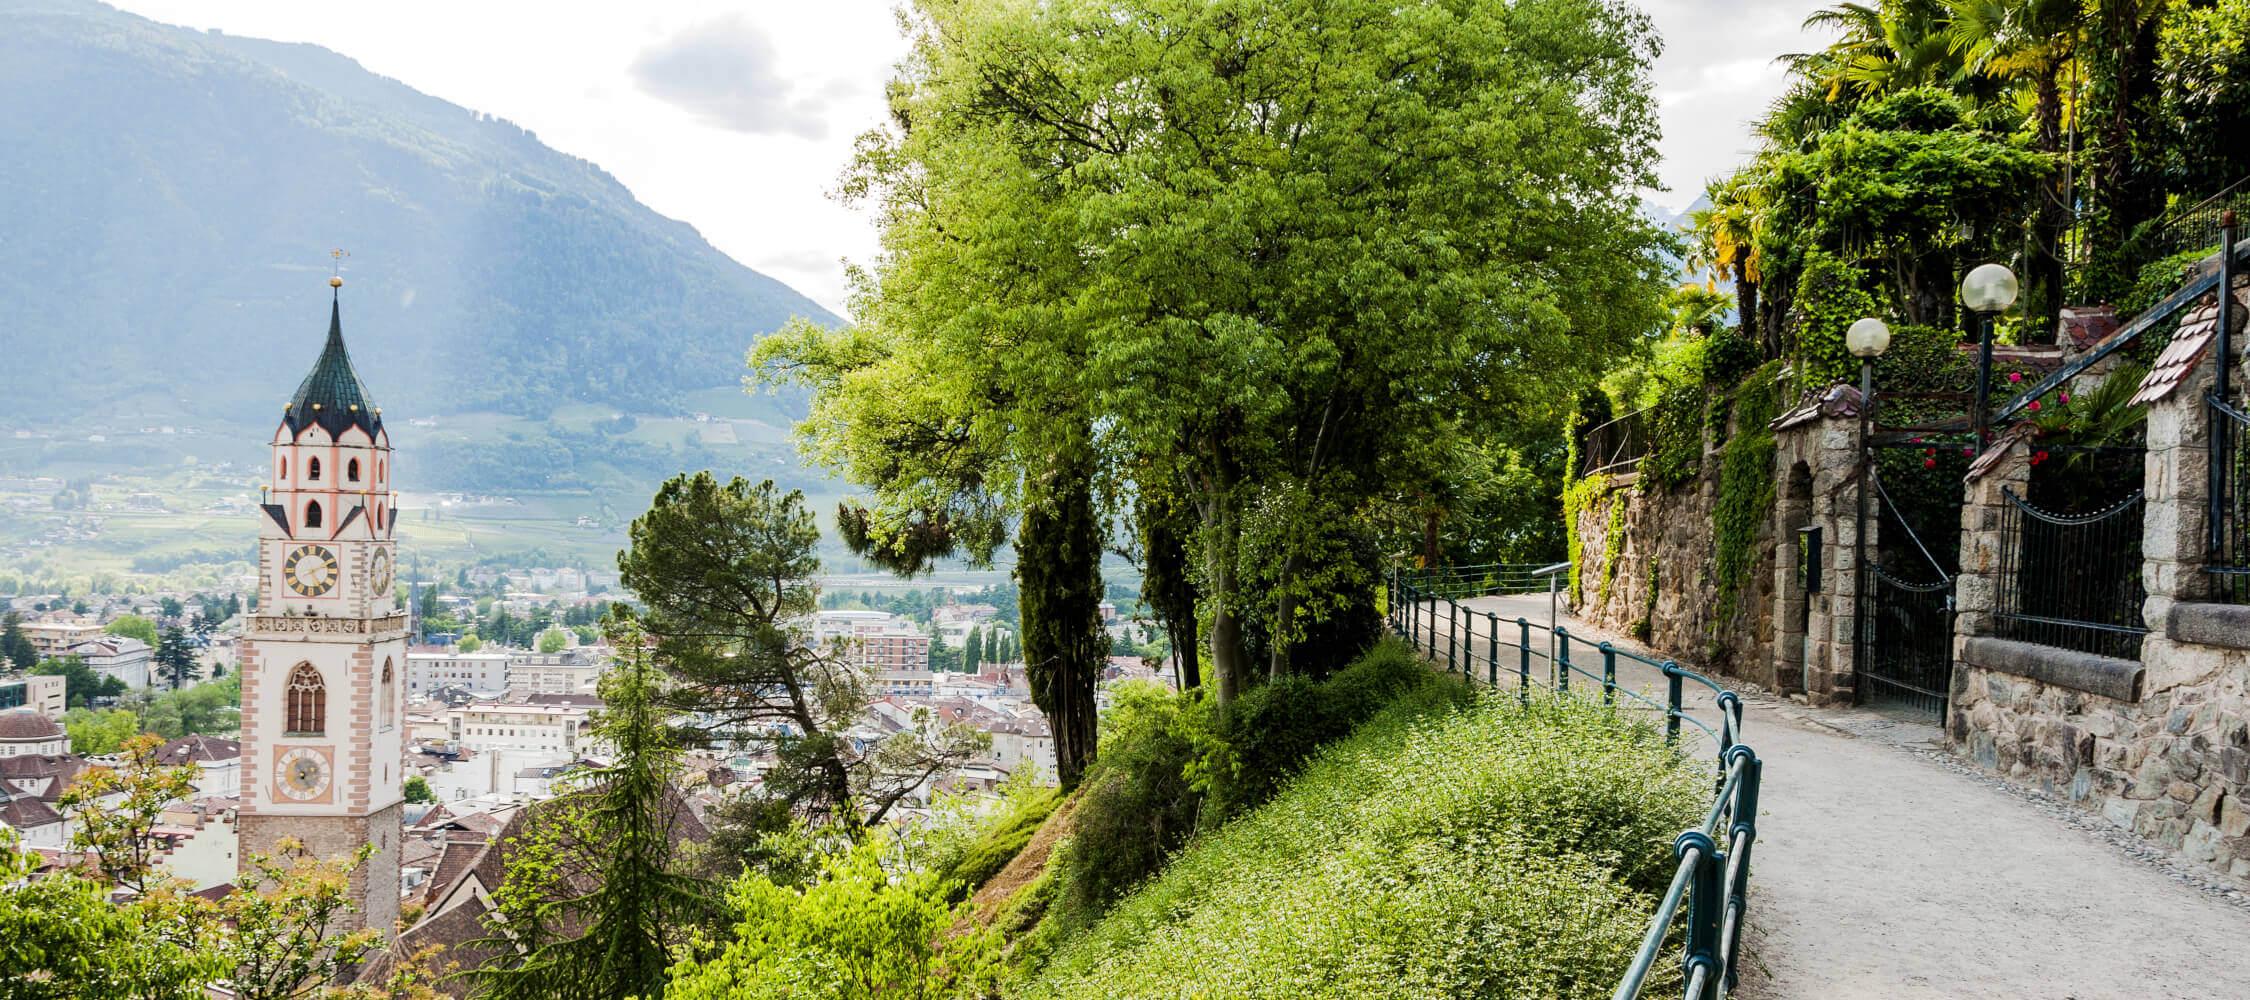 Italien-Trentino_Suedtirol_Alto_Adige_Merano_Meran_Natur_Panorama_Talkessel_Tappeinerweg_Stadt_110871940_2250x1000